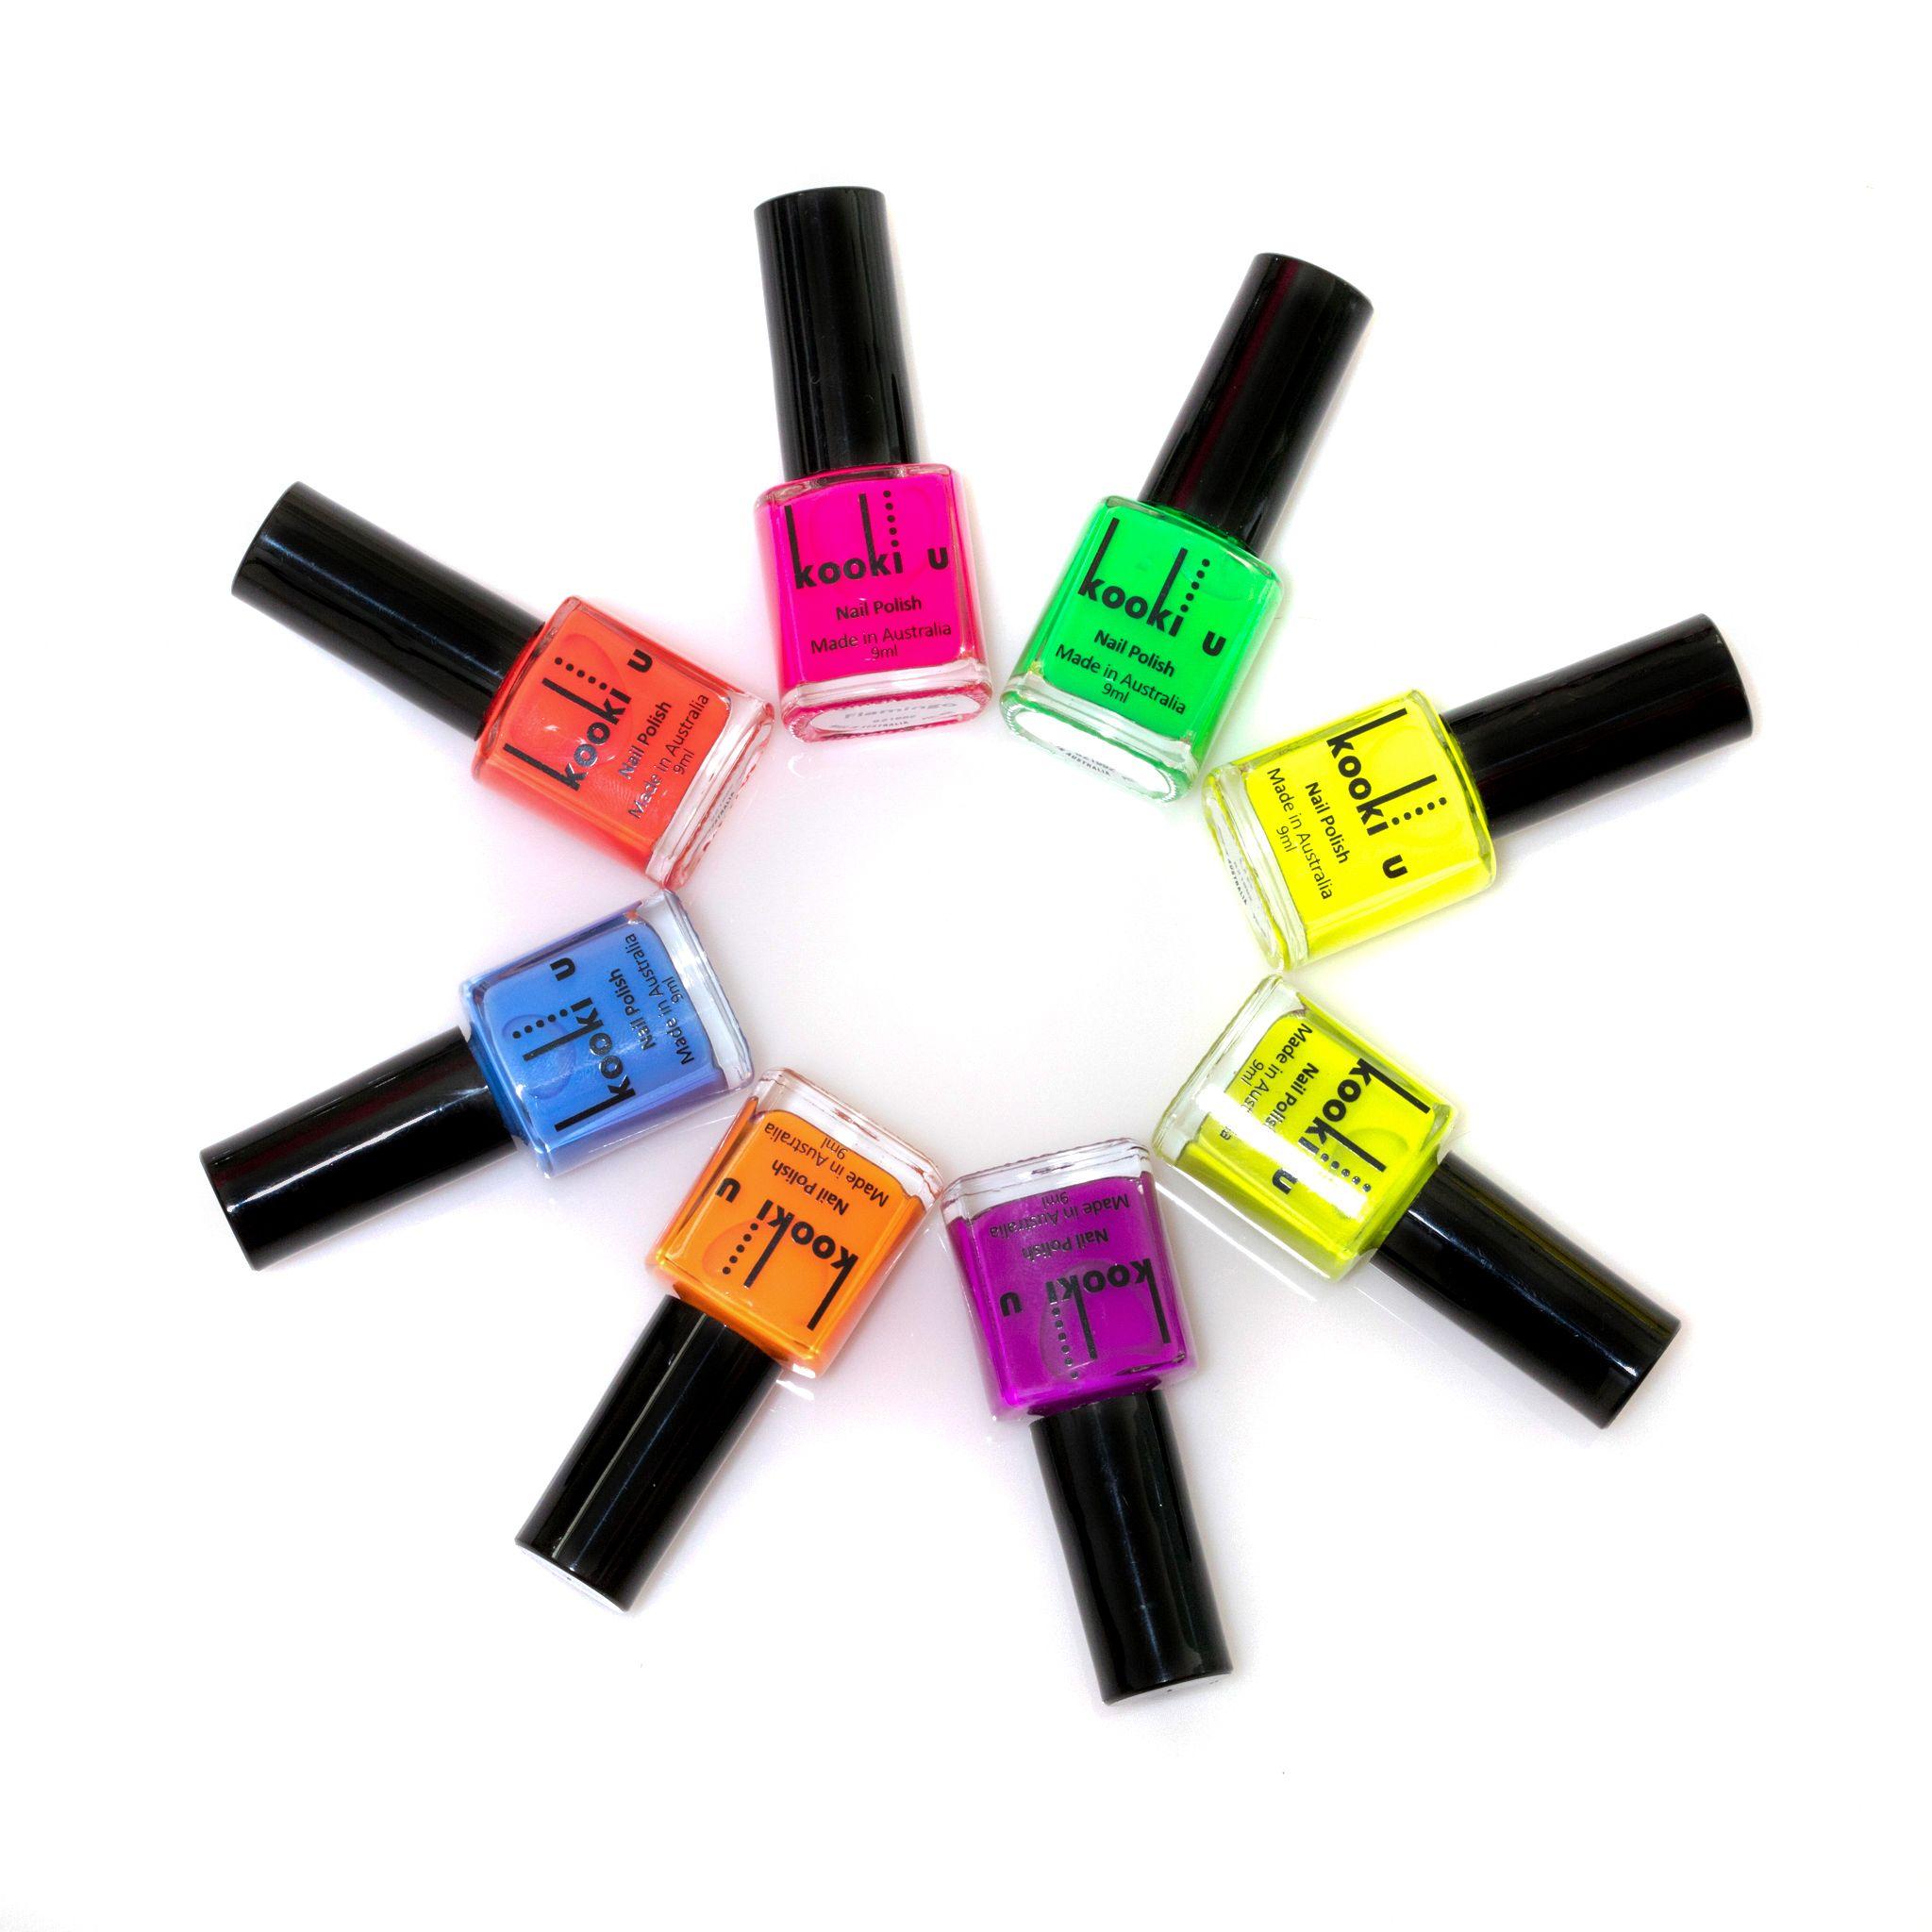 This is our neon colour range. kookiu kookiuaustralia